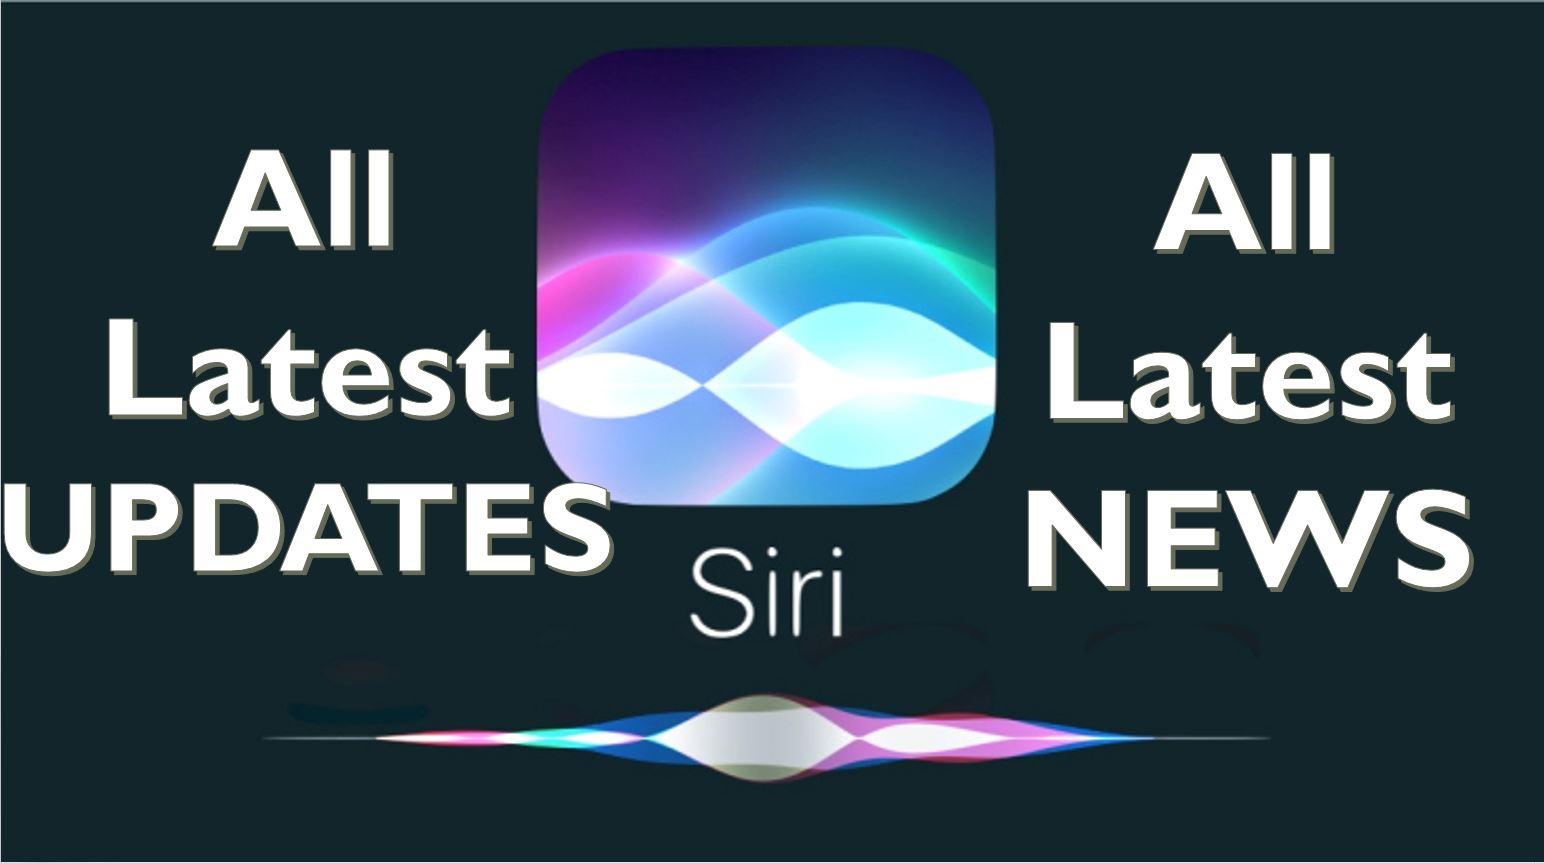 Sir All Latest Updates and News - Tech Urdu Siri - All Latest Updates